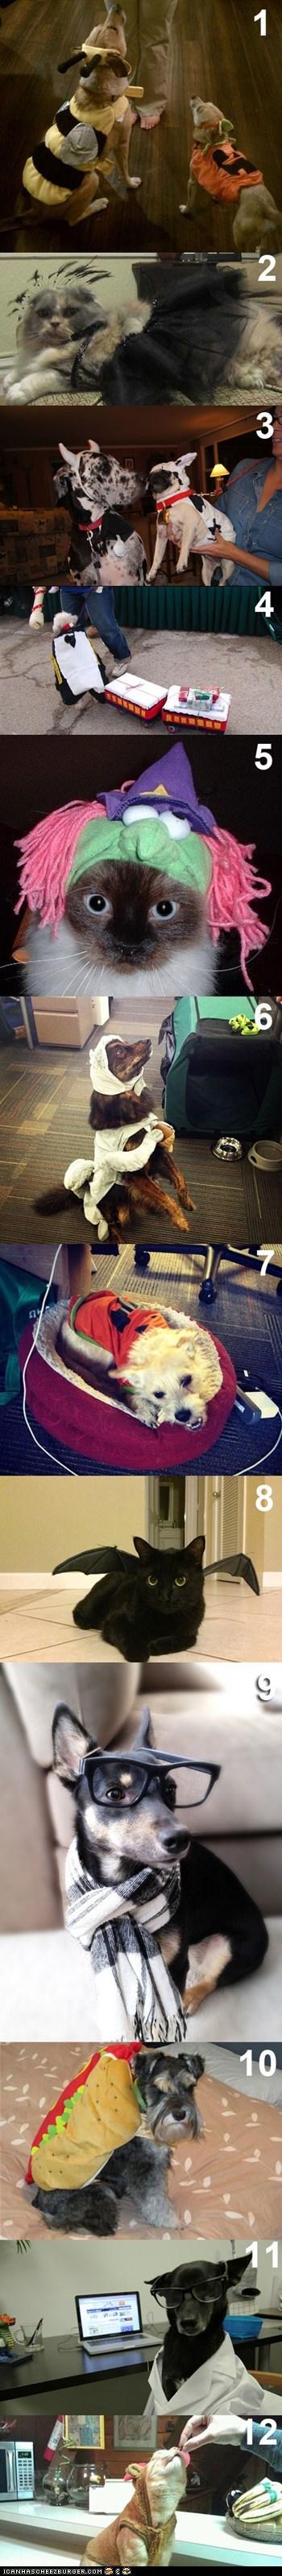 halloween pets costume holidays polls poll cheezburger - 6688047616